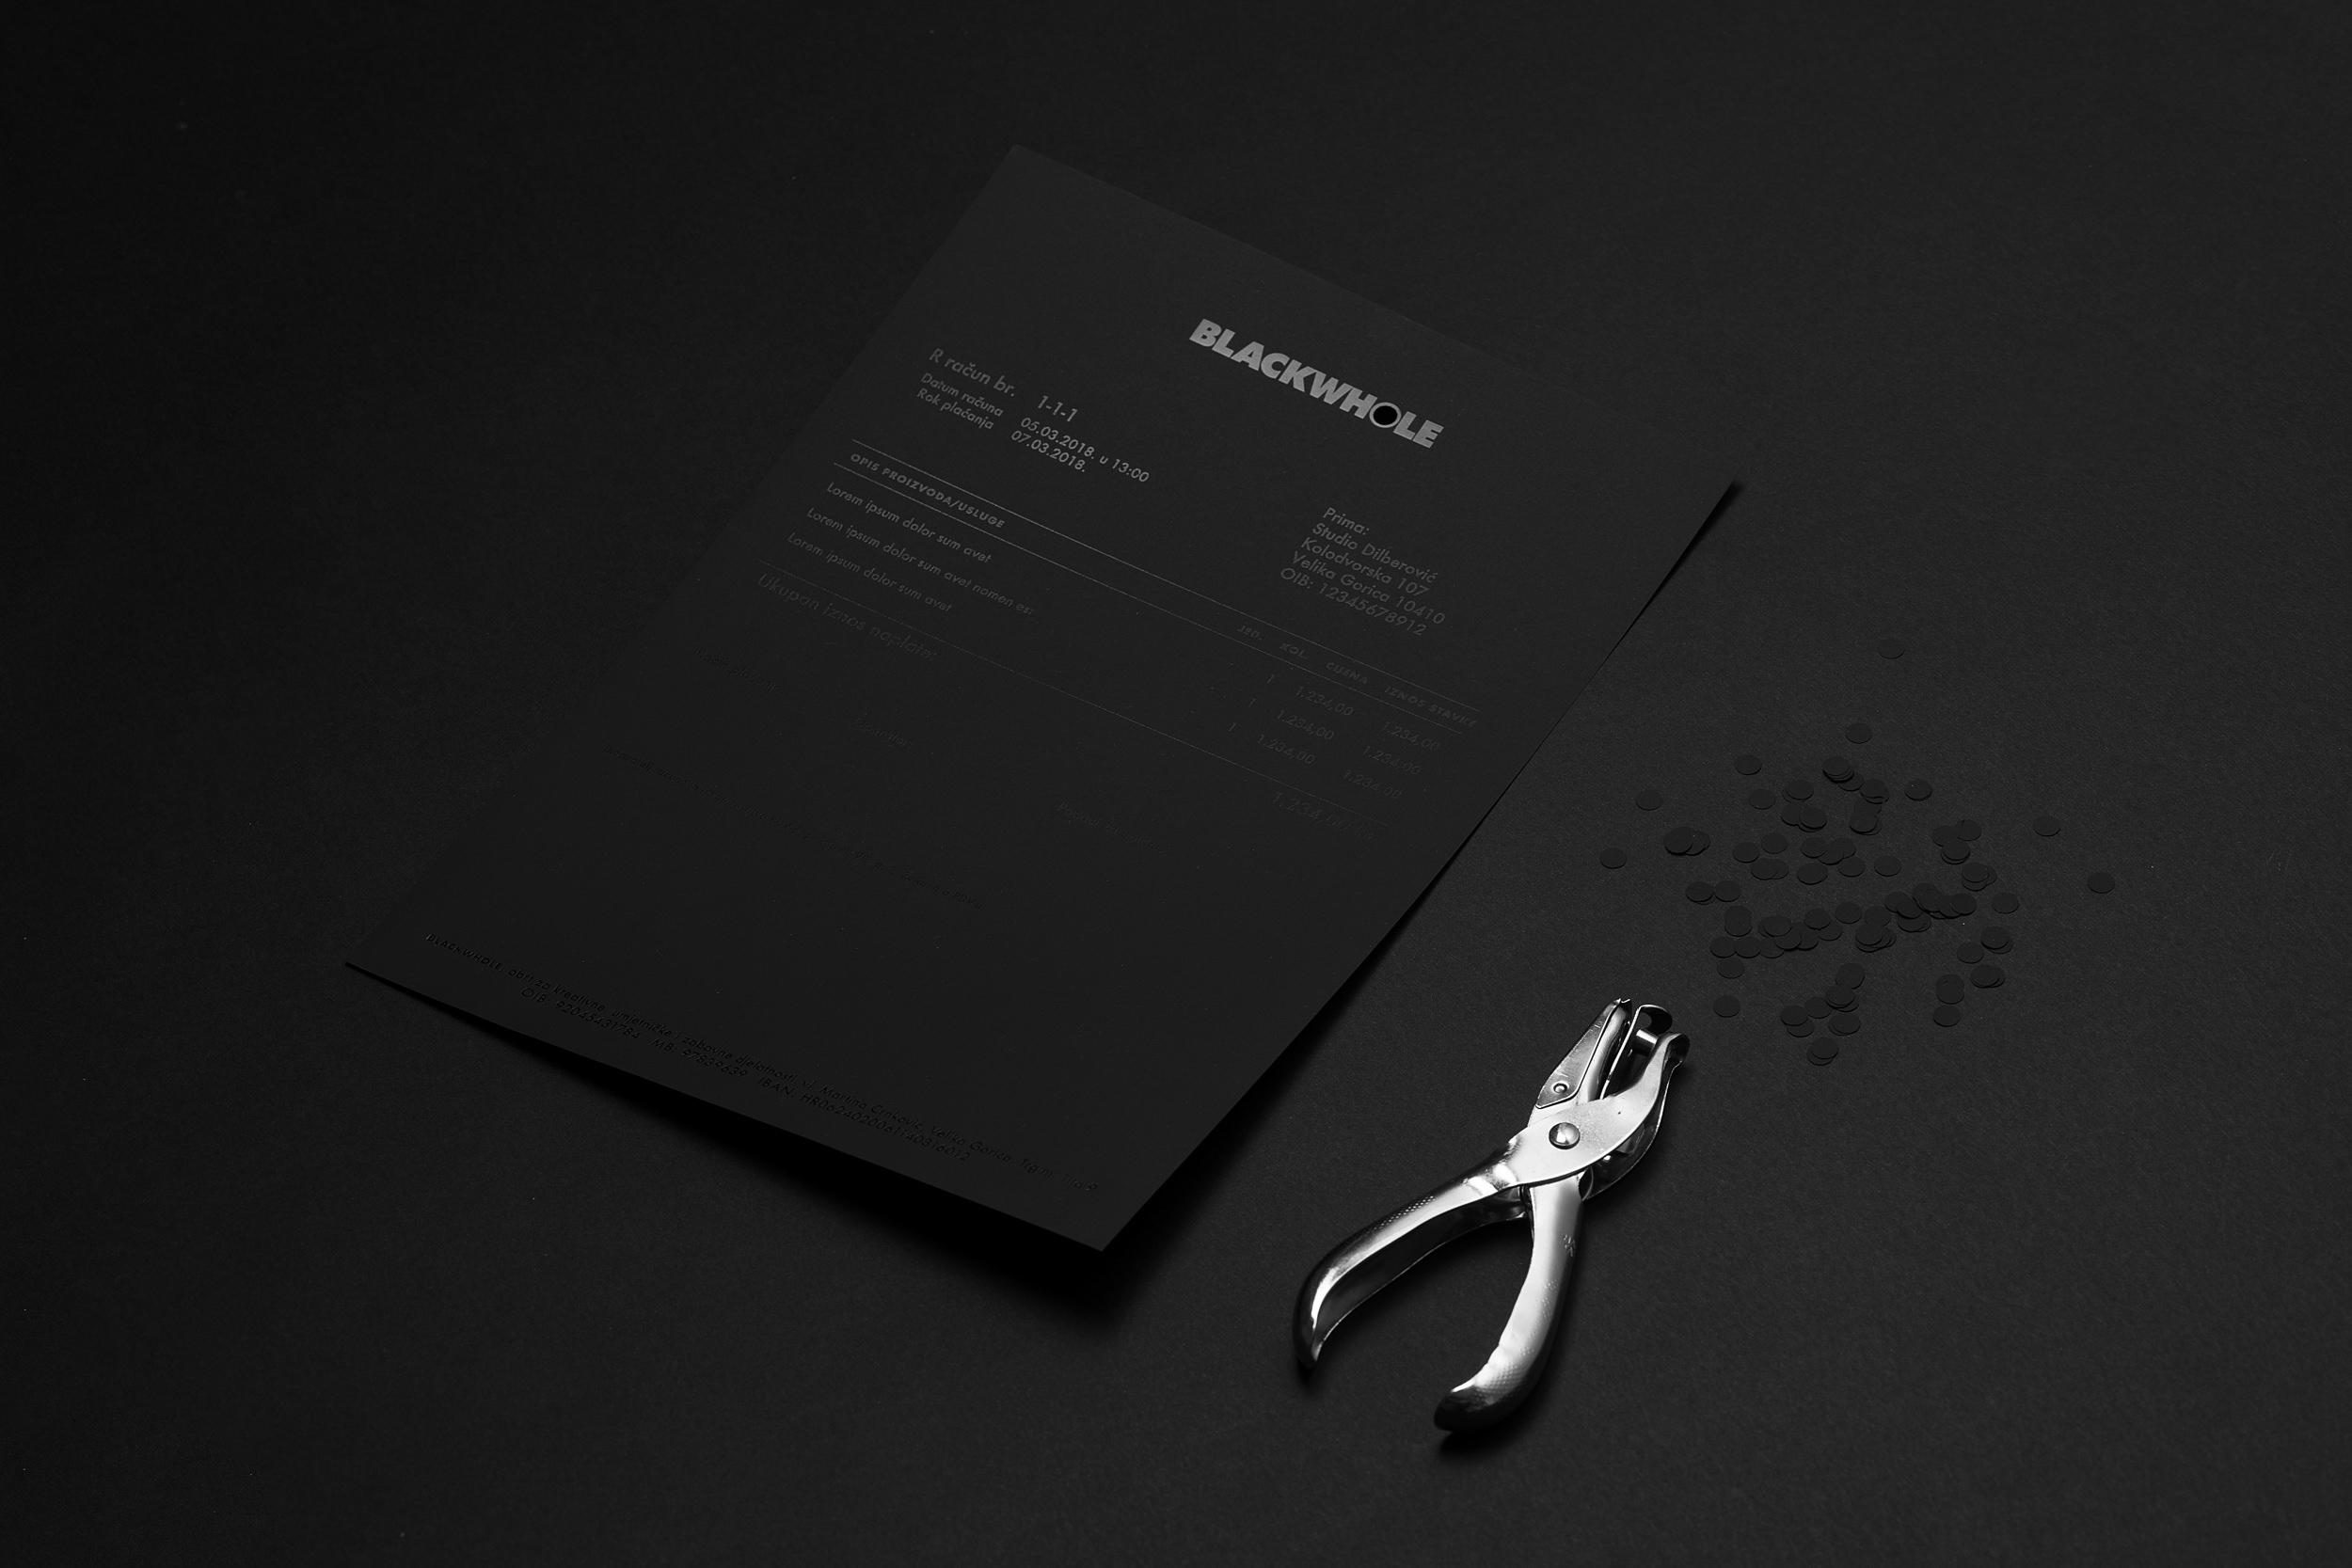 Black On Black BLACKWHOLE Branding By Ivan Dilberovic